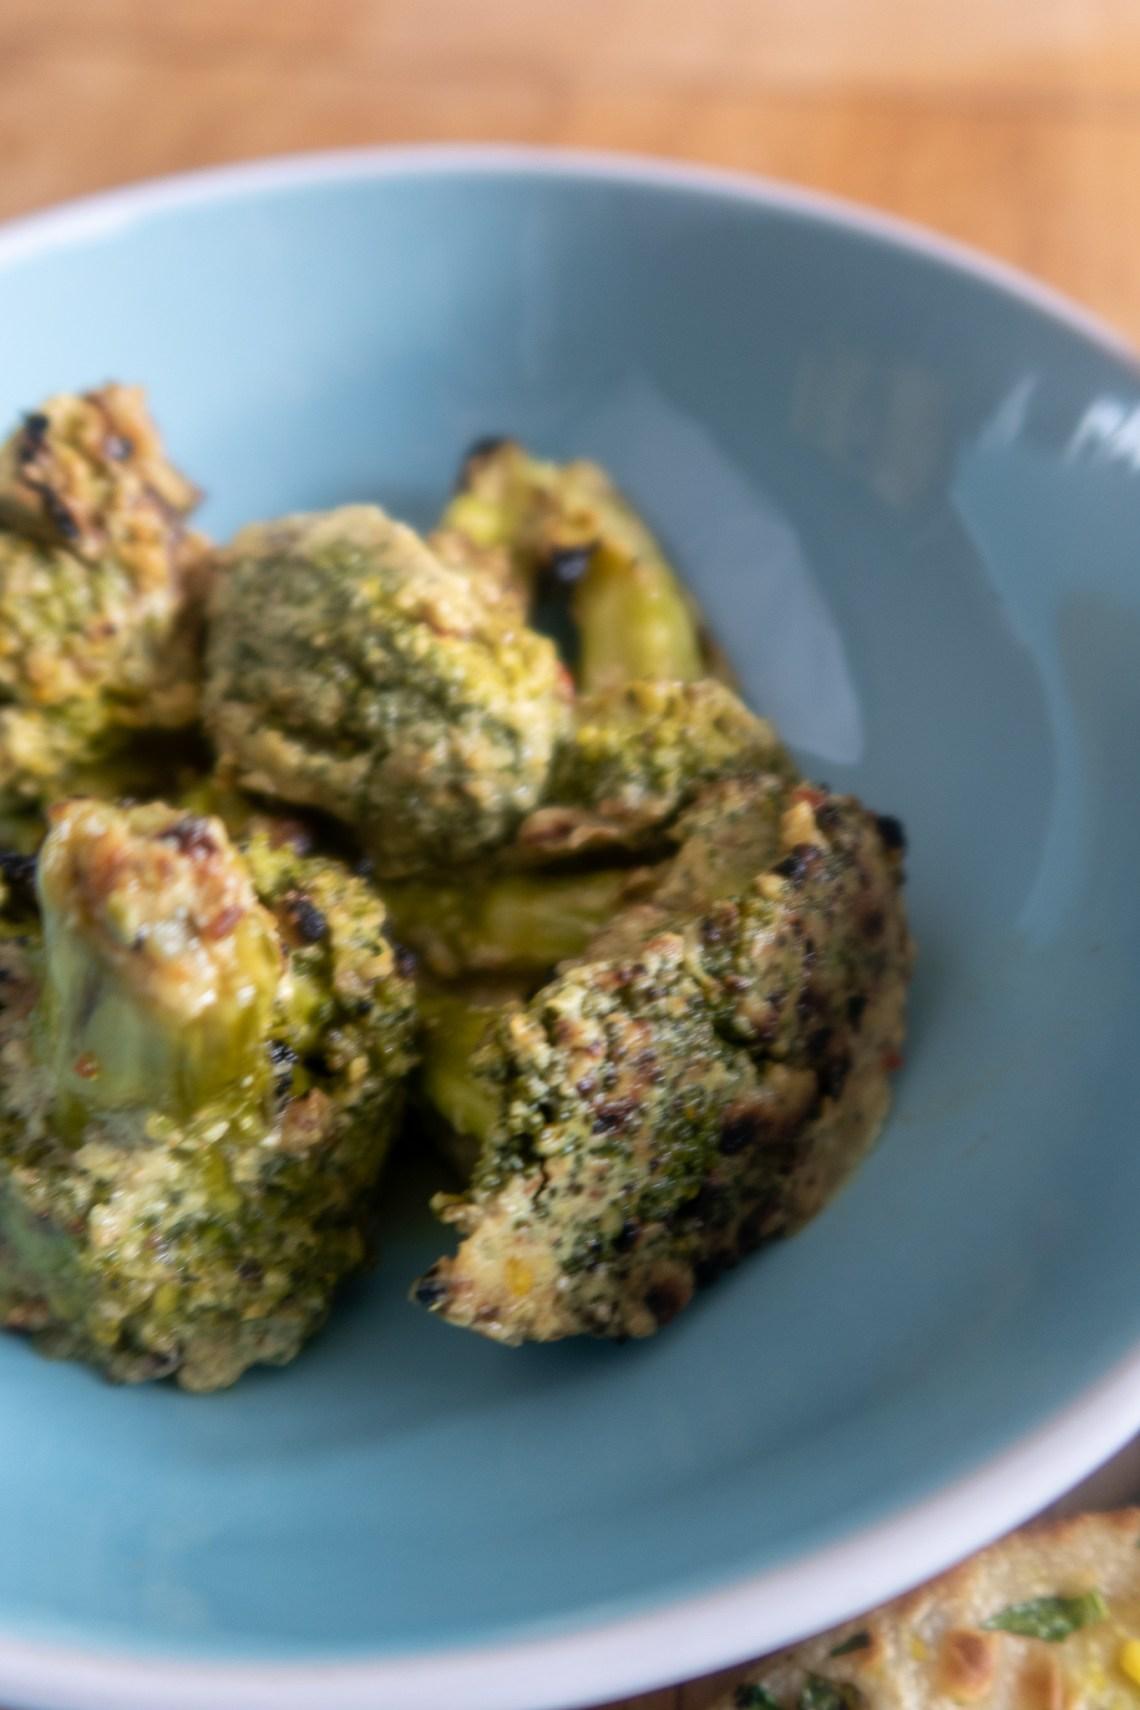 Mali Broccoli from Barfi Catering